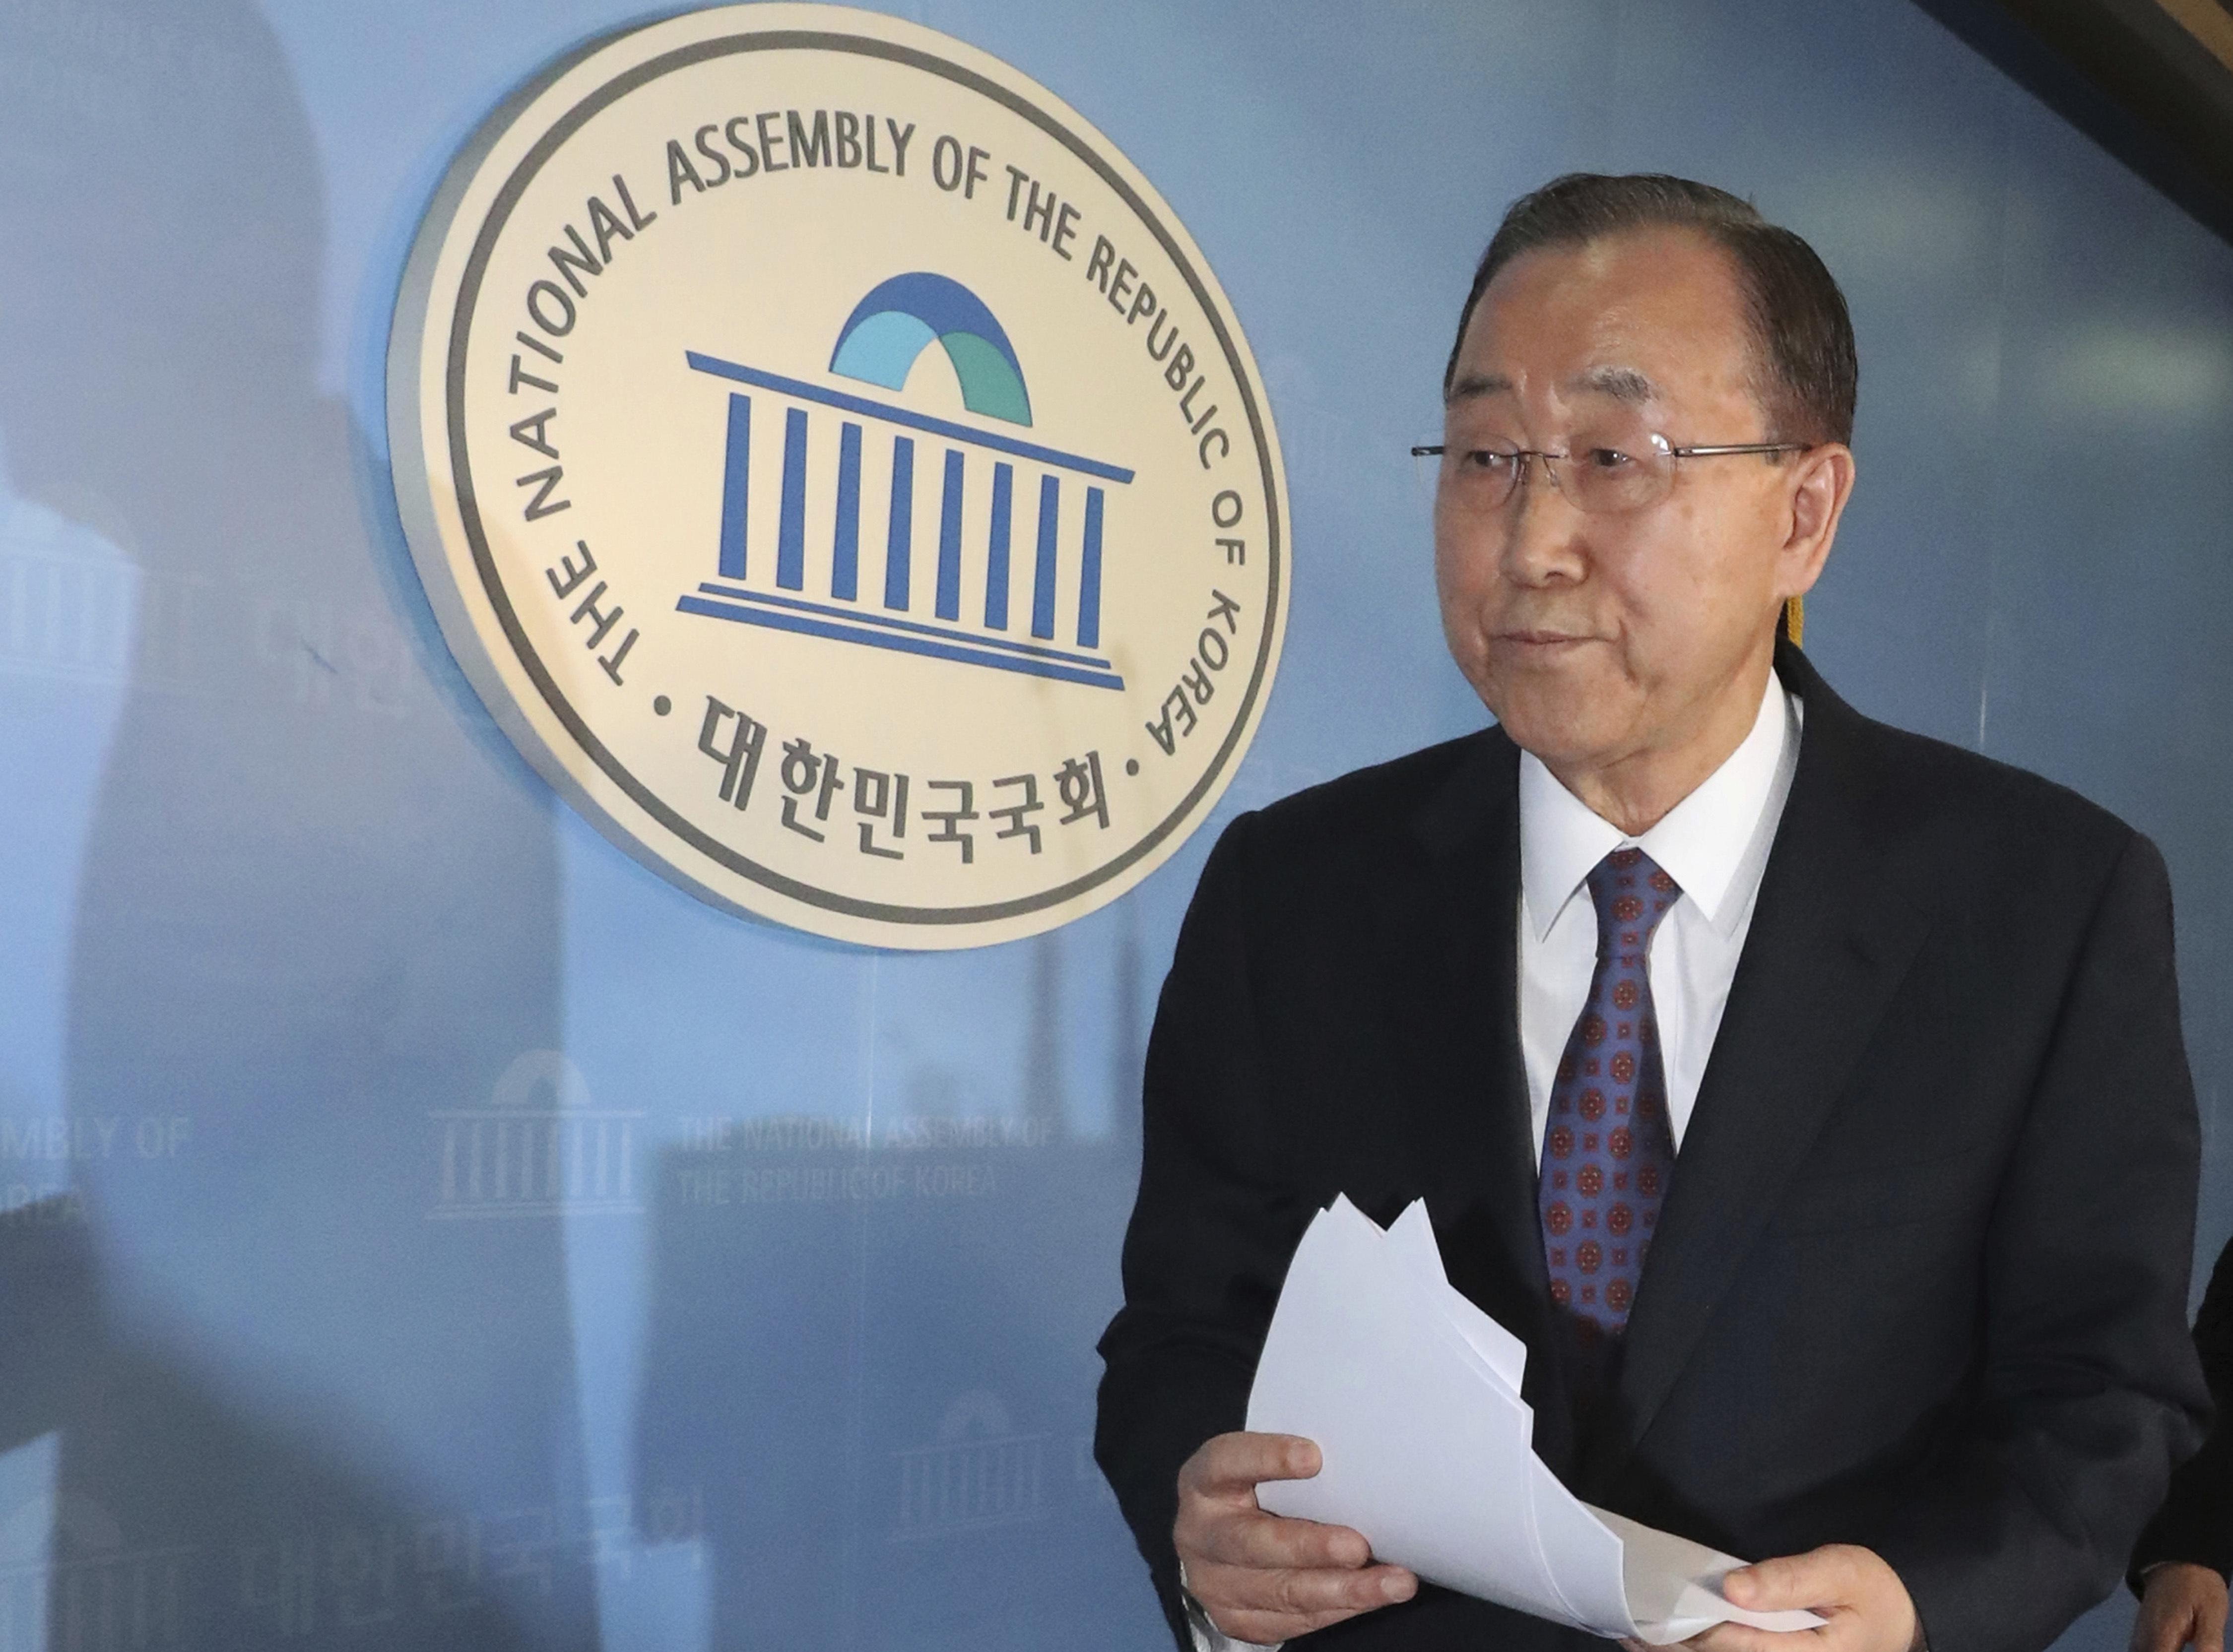 Former U.N. Secretary-General Ban Ki-moon leaves after a press conference at the National Assembly in Seoul, South Korea on Feb. 1, 2017. (Ahn Jung-won/Yonhap via AP)